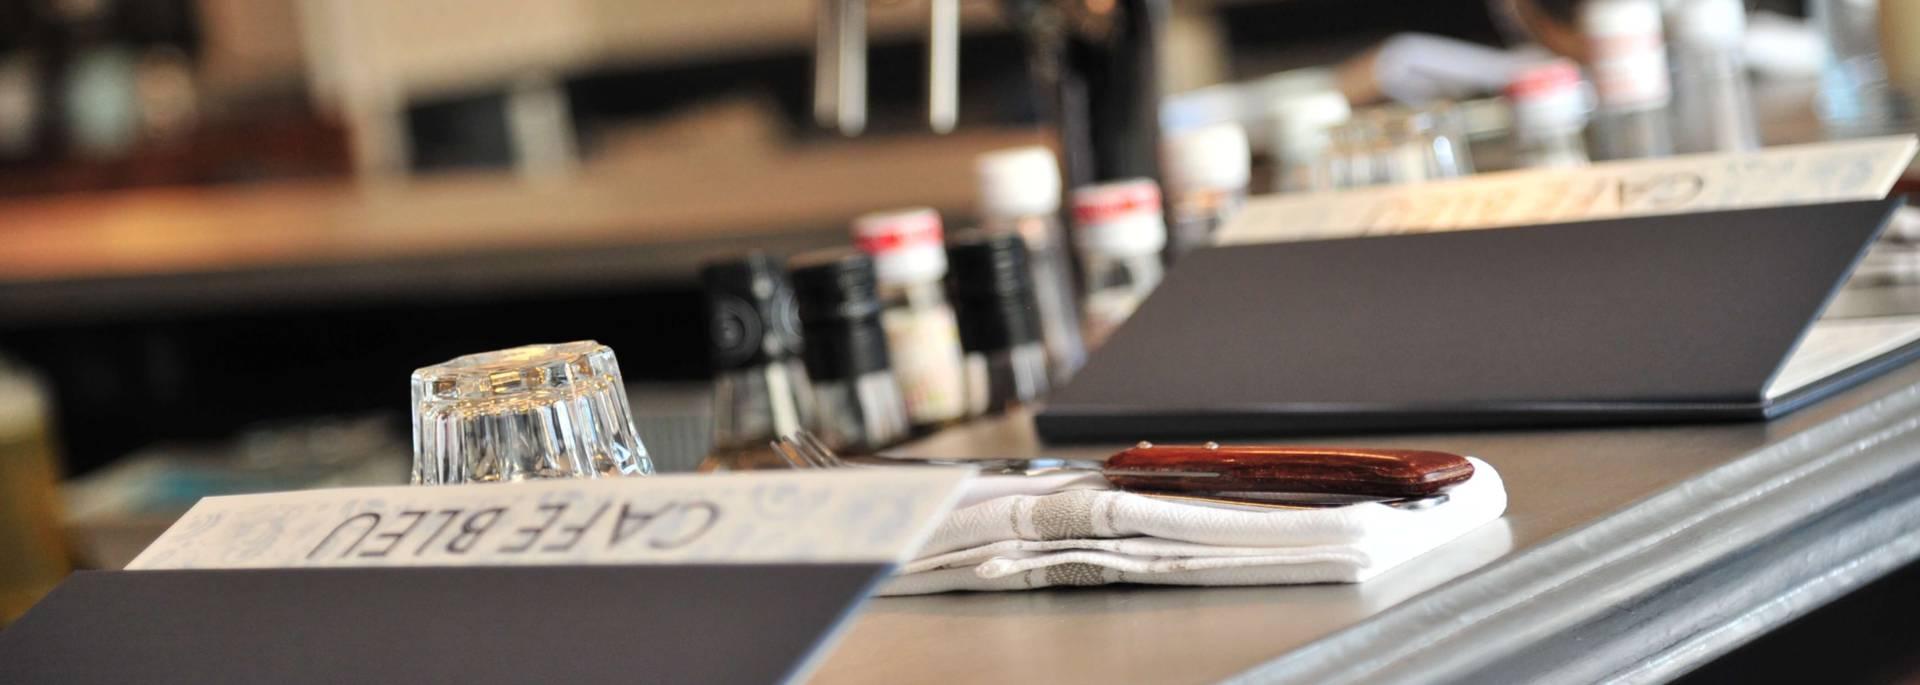 Comptoir du Café Bleu à Chartres